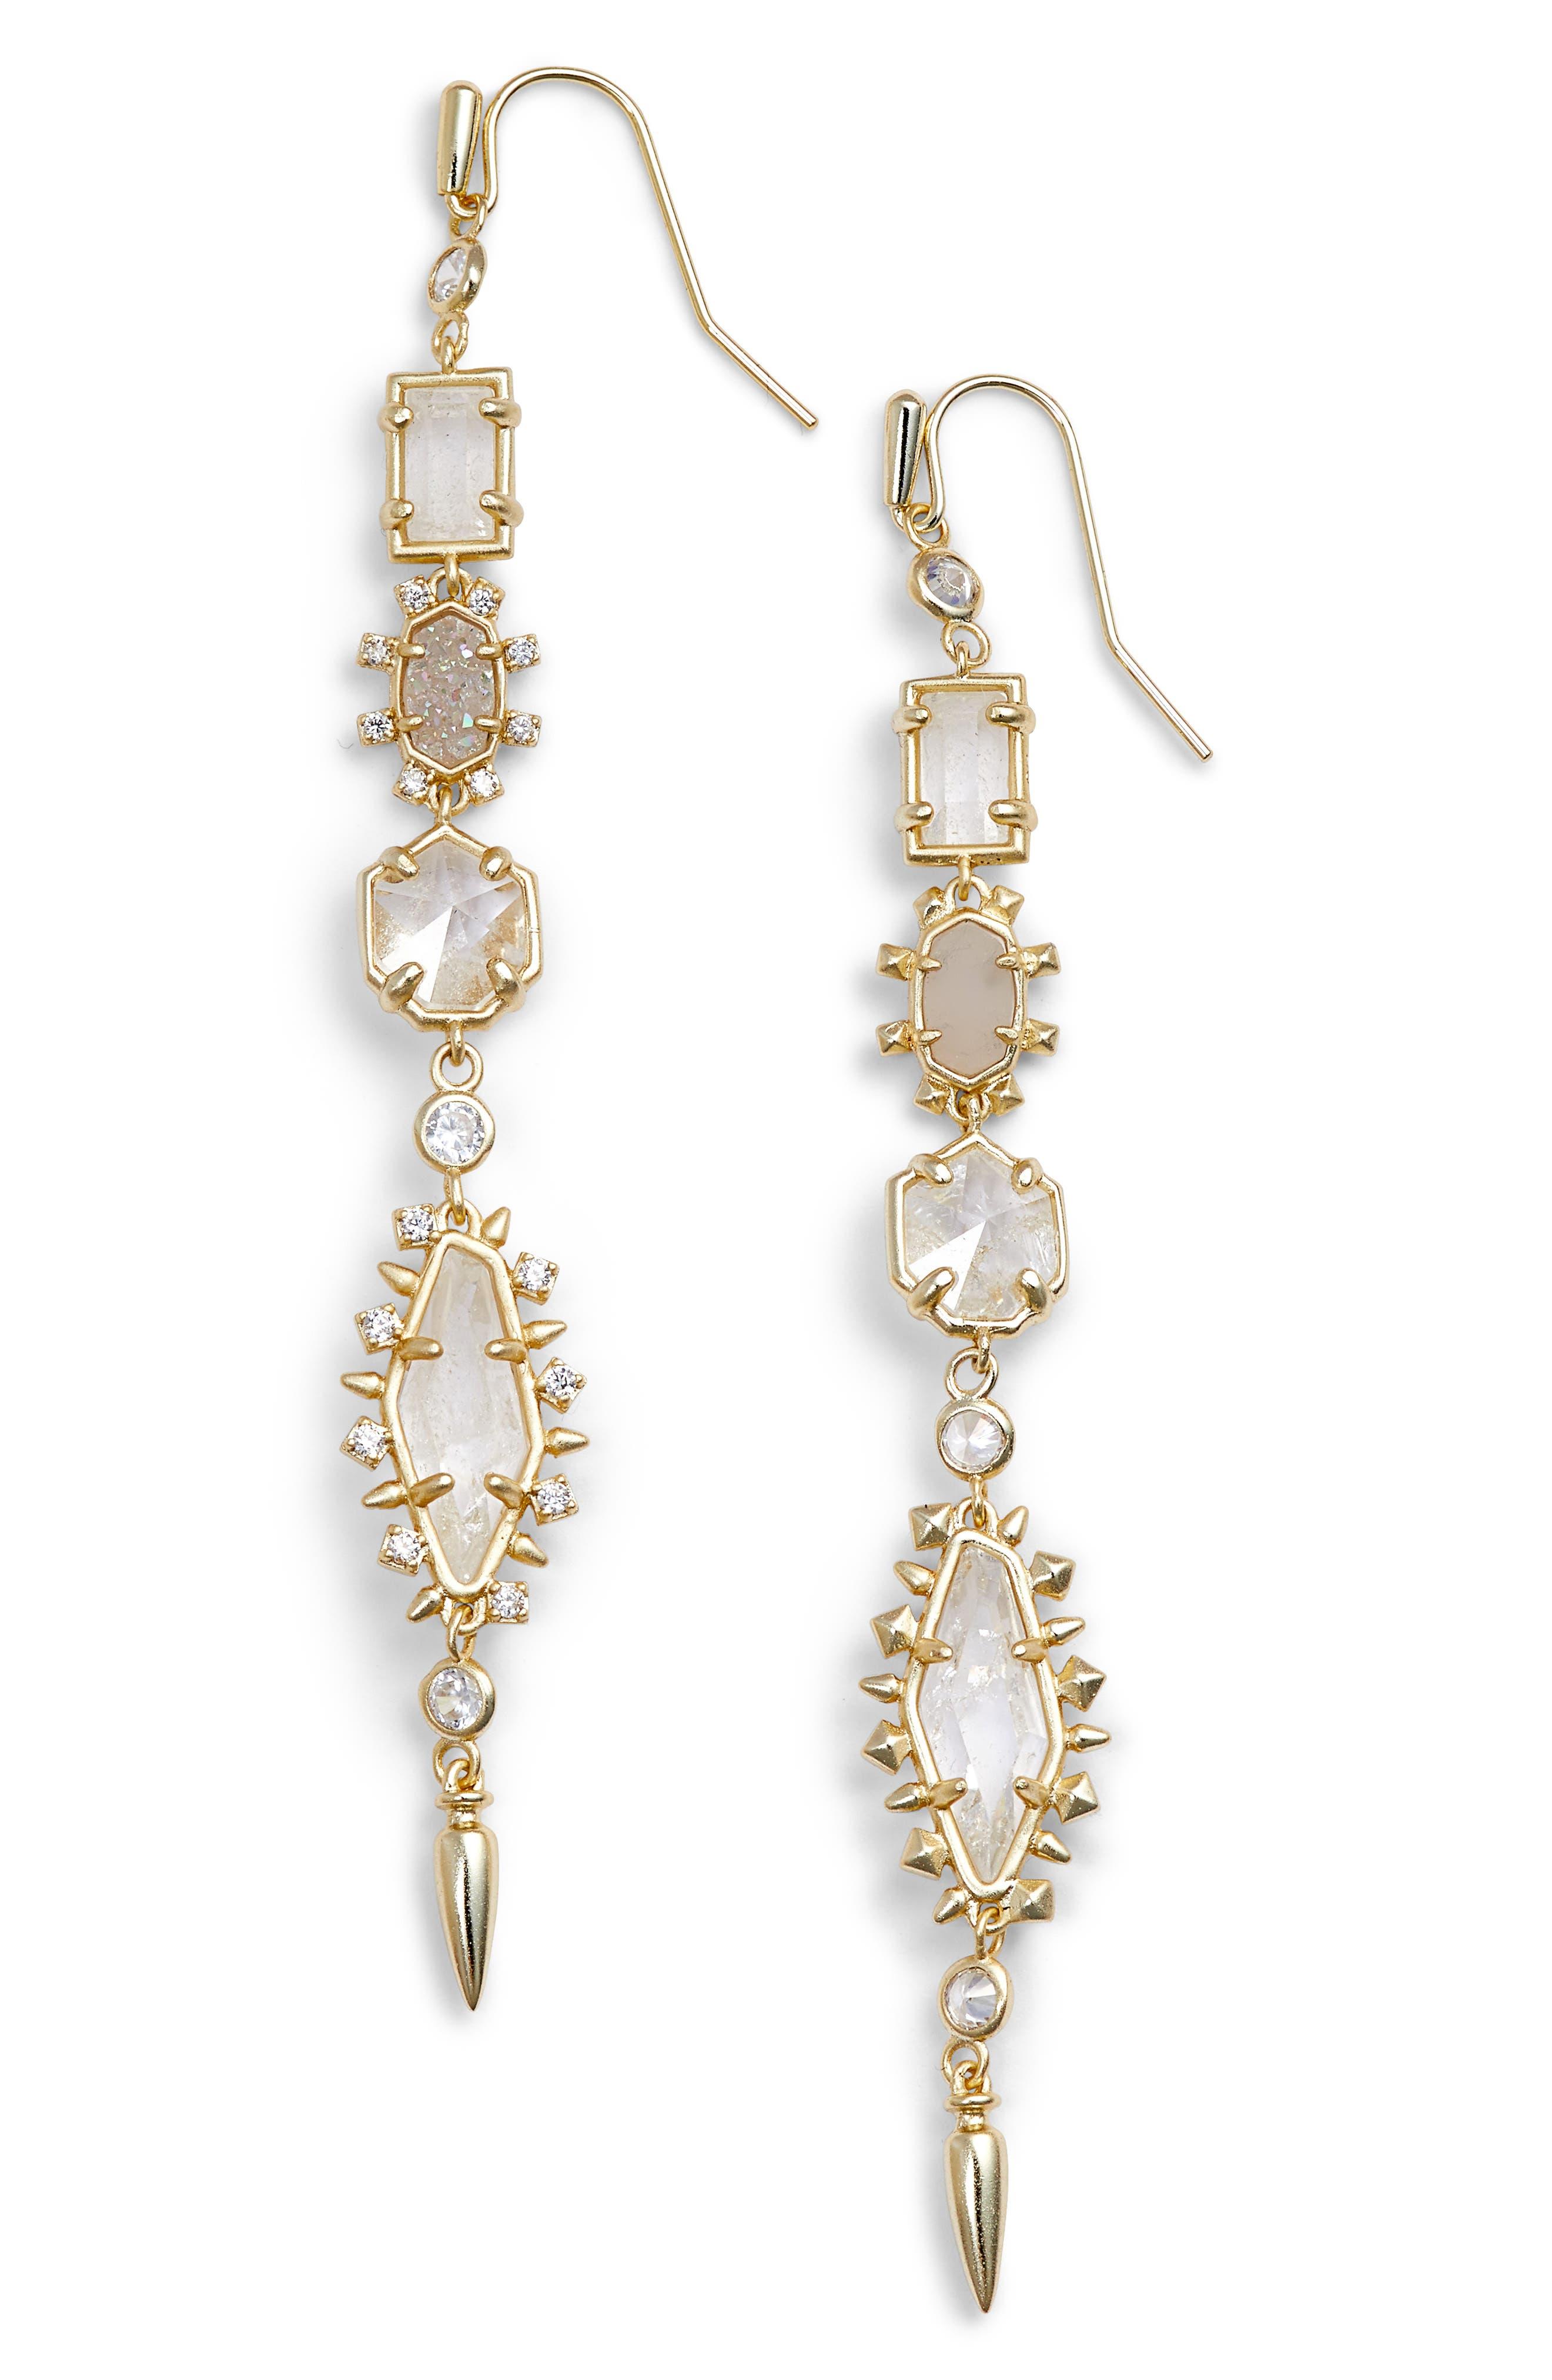 Leandra Linear Earrings,                             Main thumbnail 1, color,                             Rock Crystal Mix/ Gold